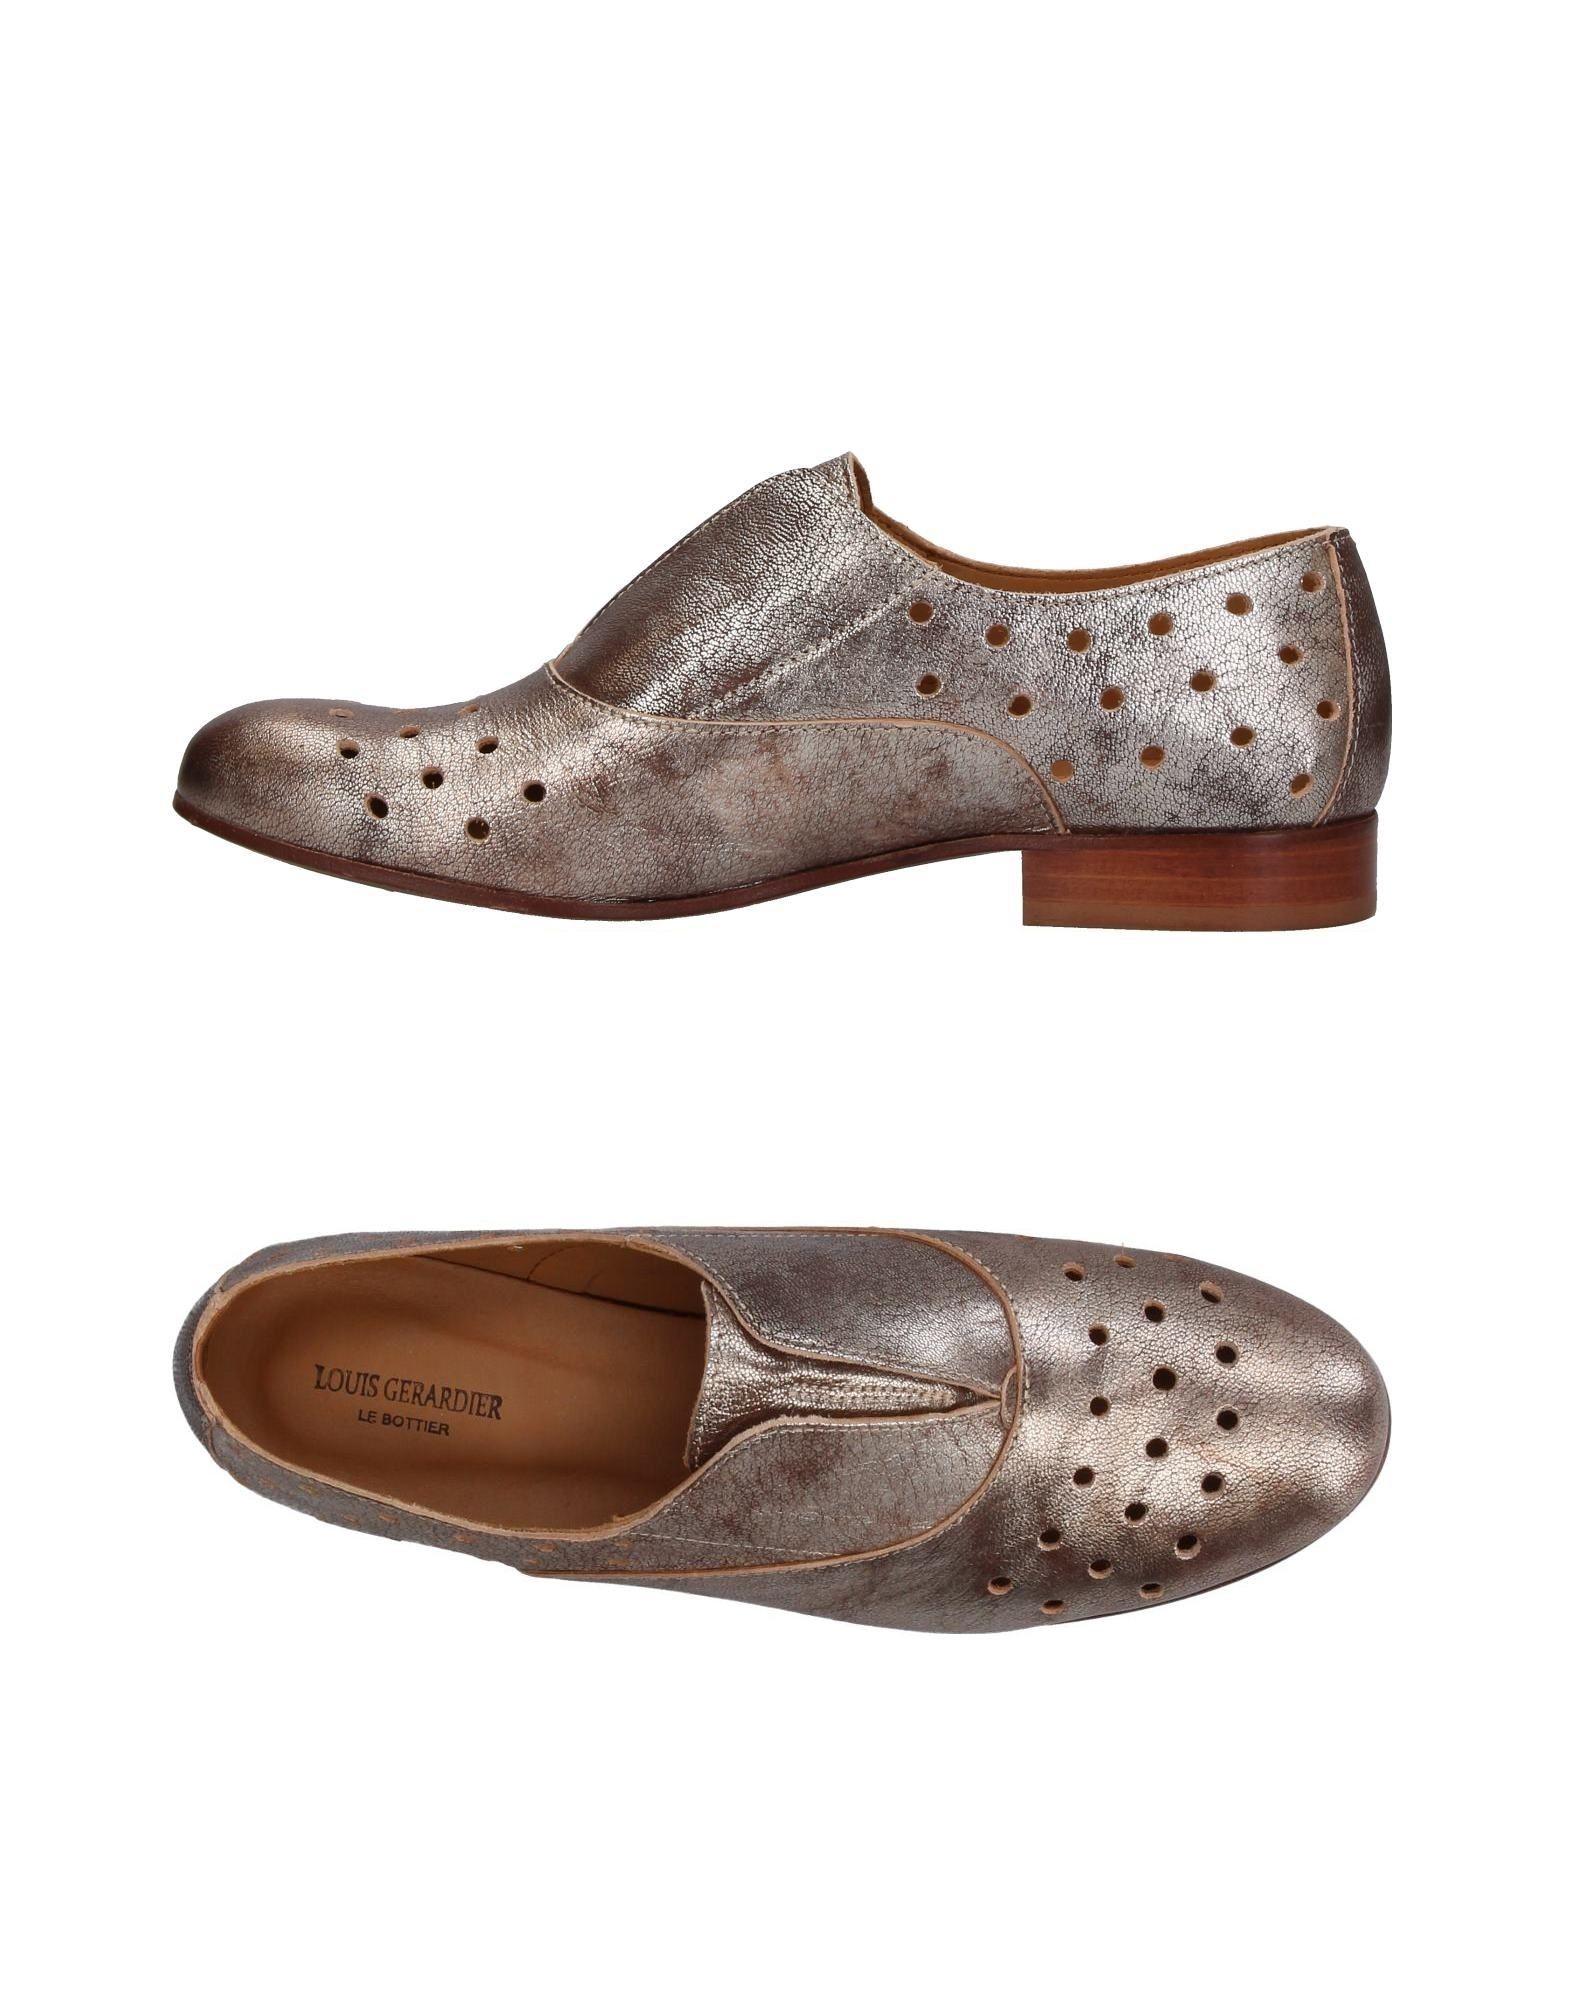 LOUIS GERARDIER Le Bottier Мокасины louis gerardier le bottier обувь на шнурках